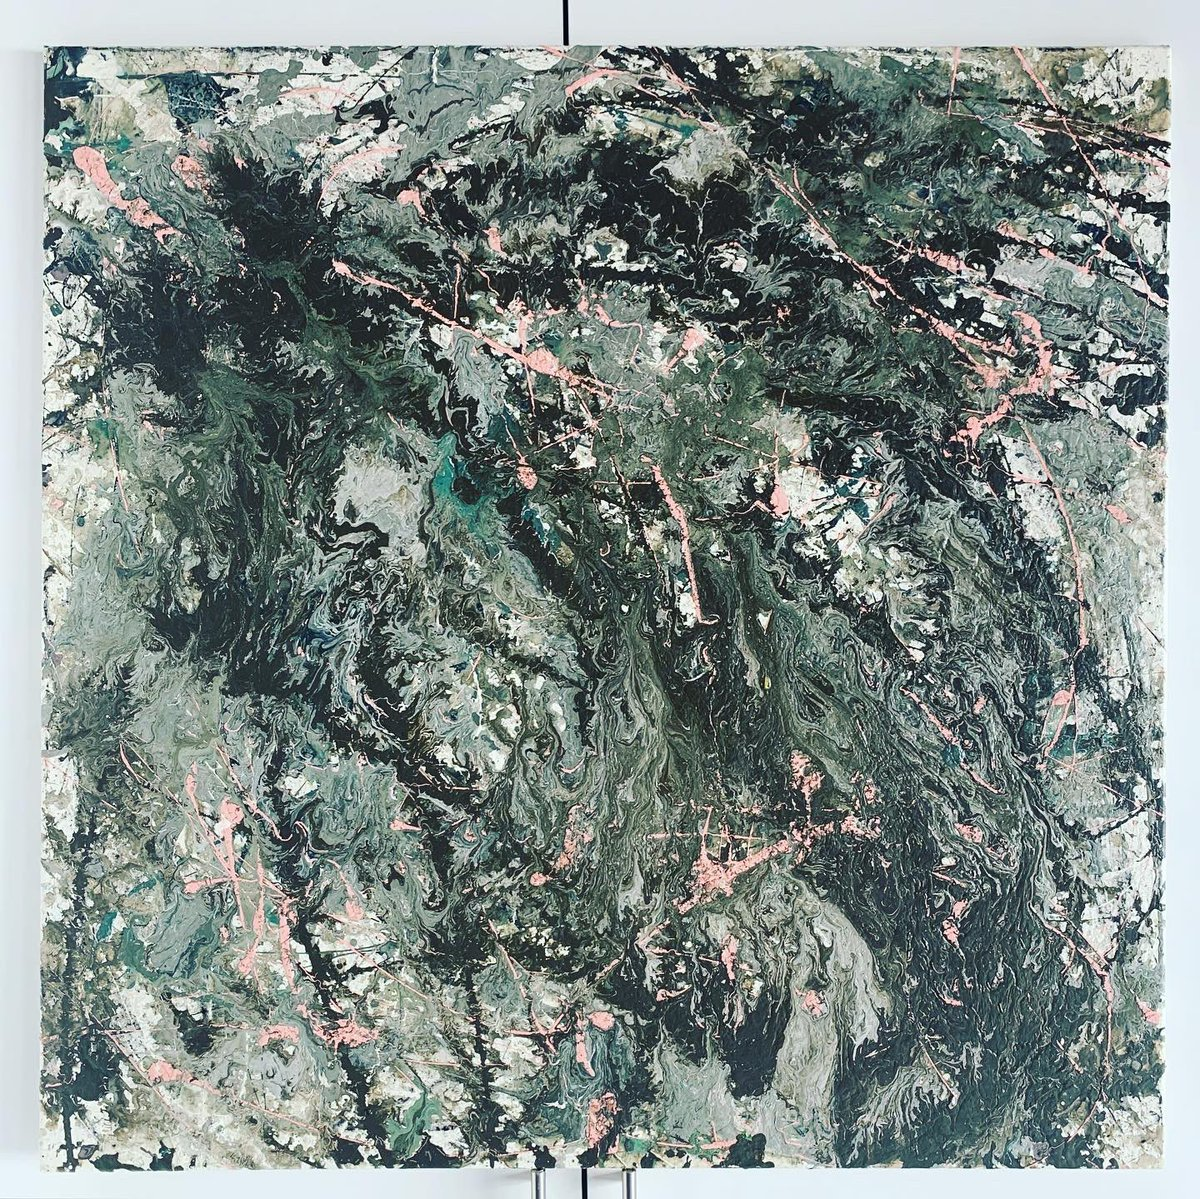 """Forest Ash""  Oil based primer on stretched framed canvas. '36 x 36' For Sale   #Artist #artoftheday #artoncanvas #art #artcollector #painting #abstract #modernpainting #myart #sellingart #buyartfromartists  #studio #studioart #twitterartpic.twitter.com/oKJvJhdgnJ"